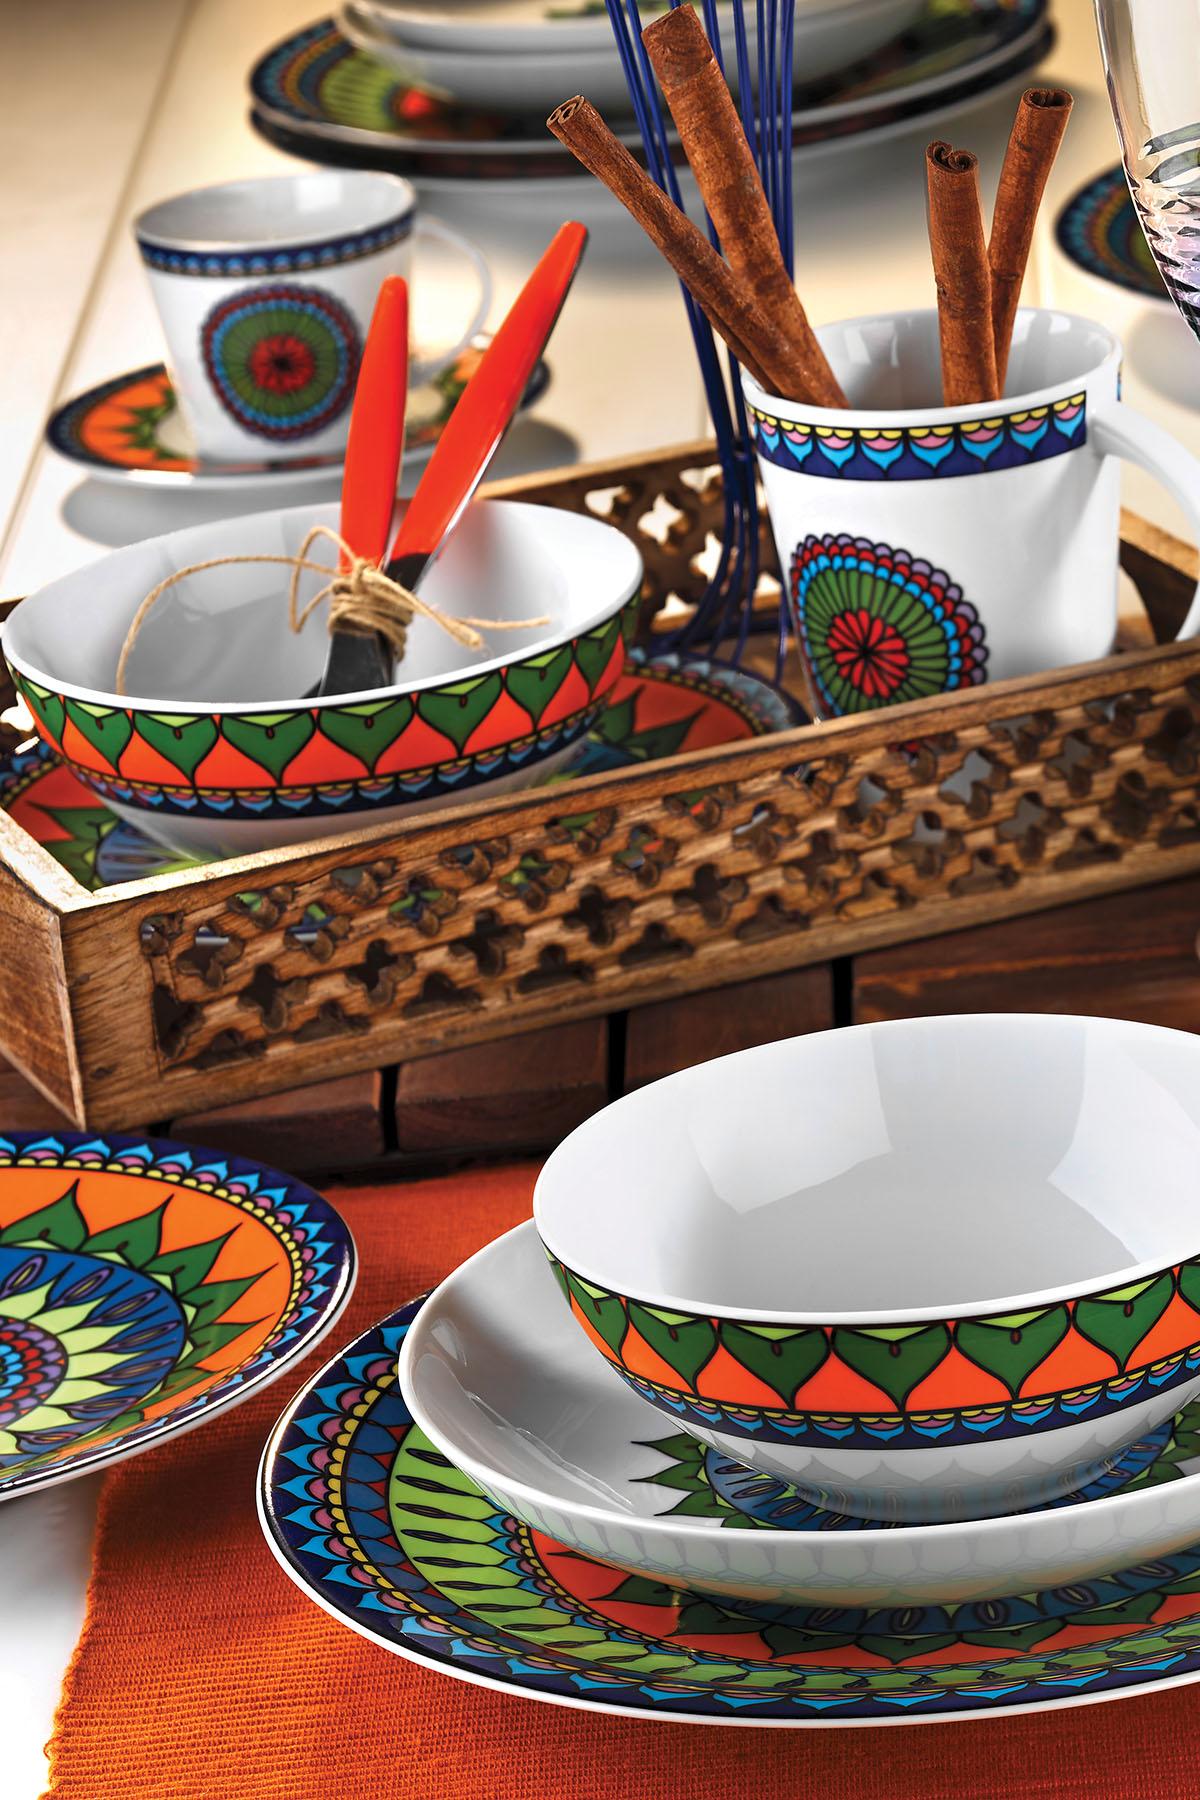 Kütahya Porselen - Kütahya Porselen 8982 Desen 24 Parça Yemek Seti